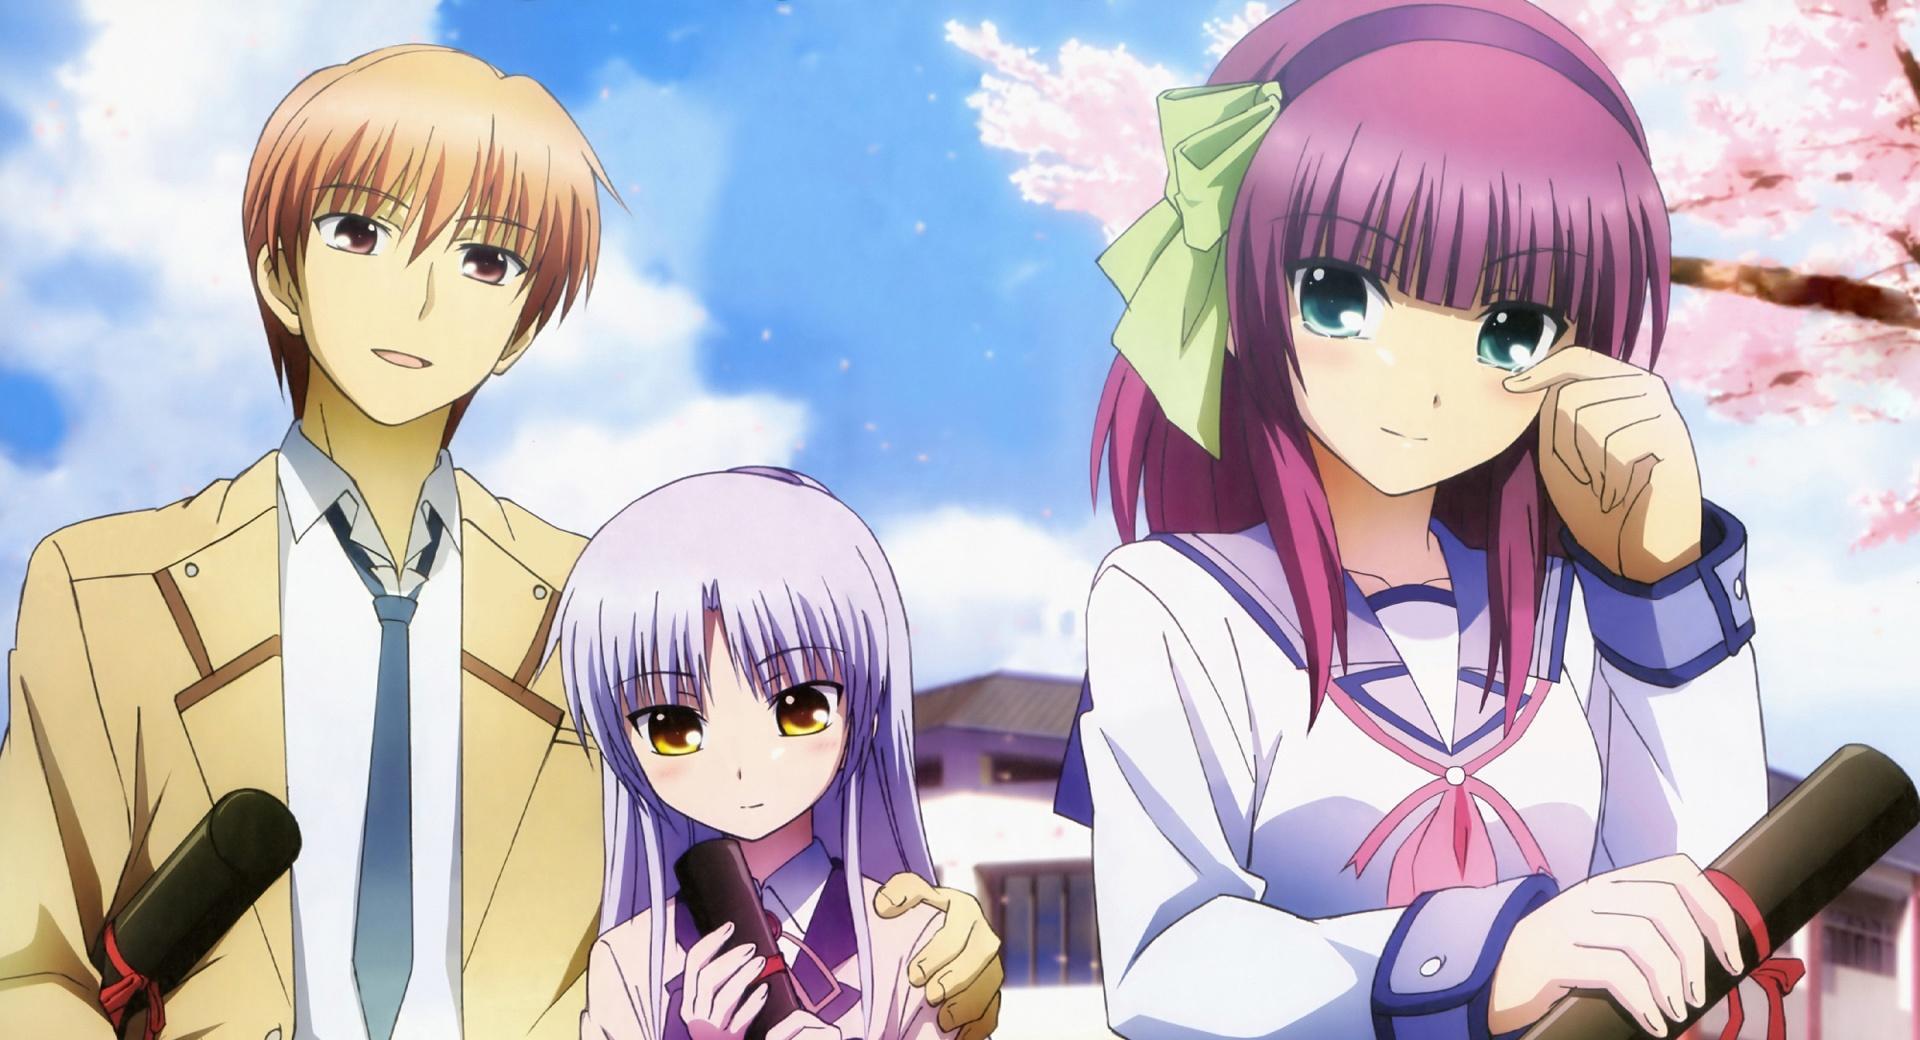 Angel Beats - Otonashi, Yuri and Angel wallpapers HD quality